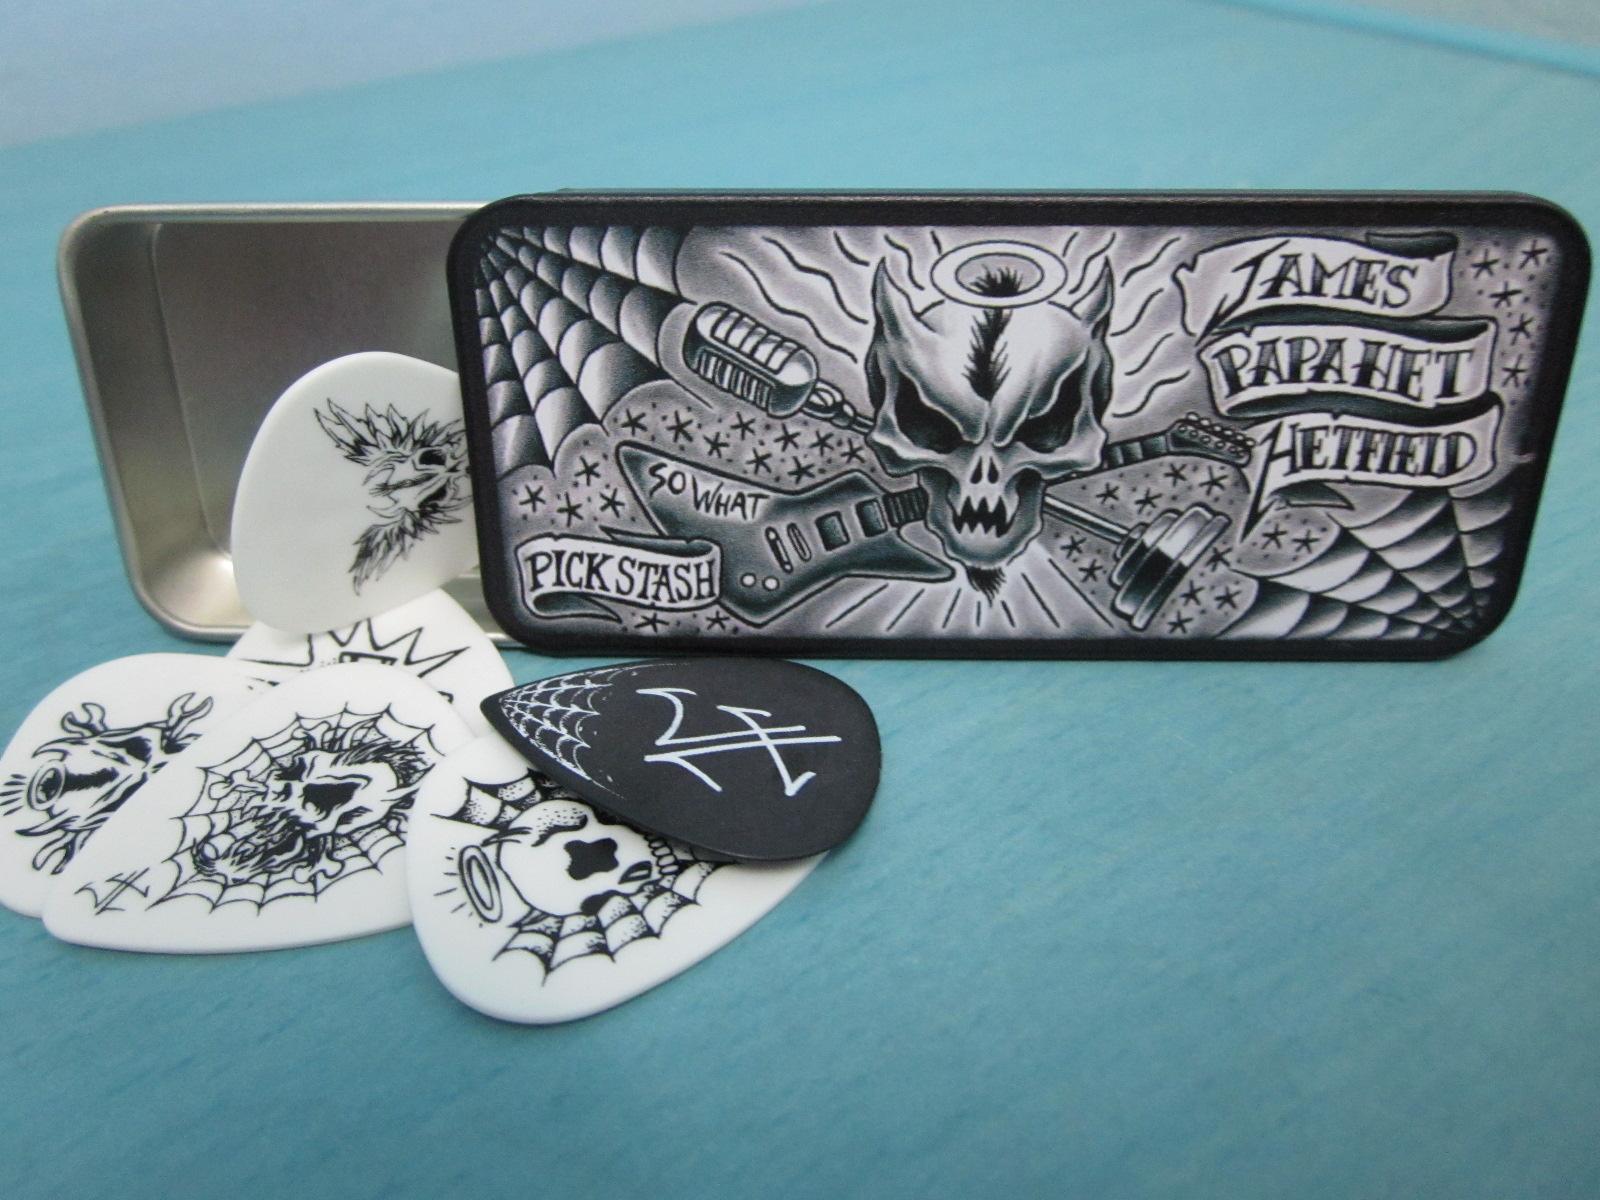 maximus guitars accessories james hetfield signature picks in tin. Black Bedroom Furniture Sets. Home Design Ideas